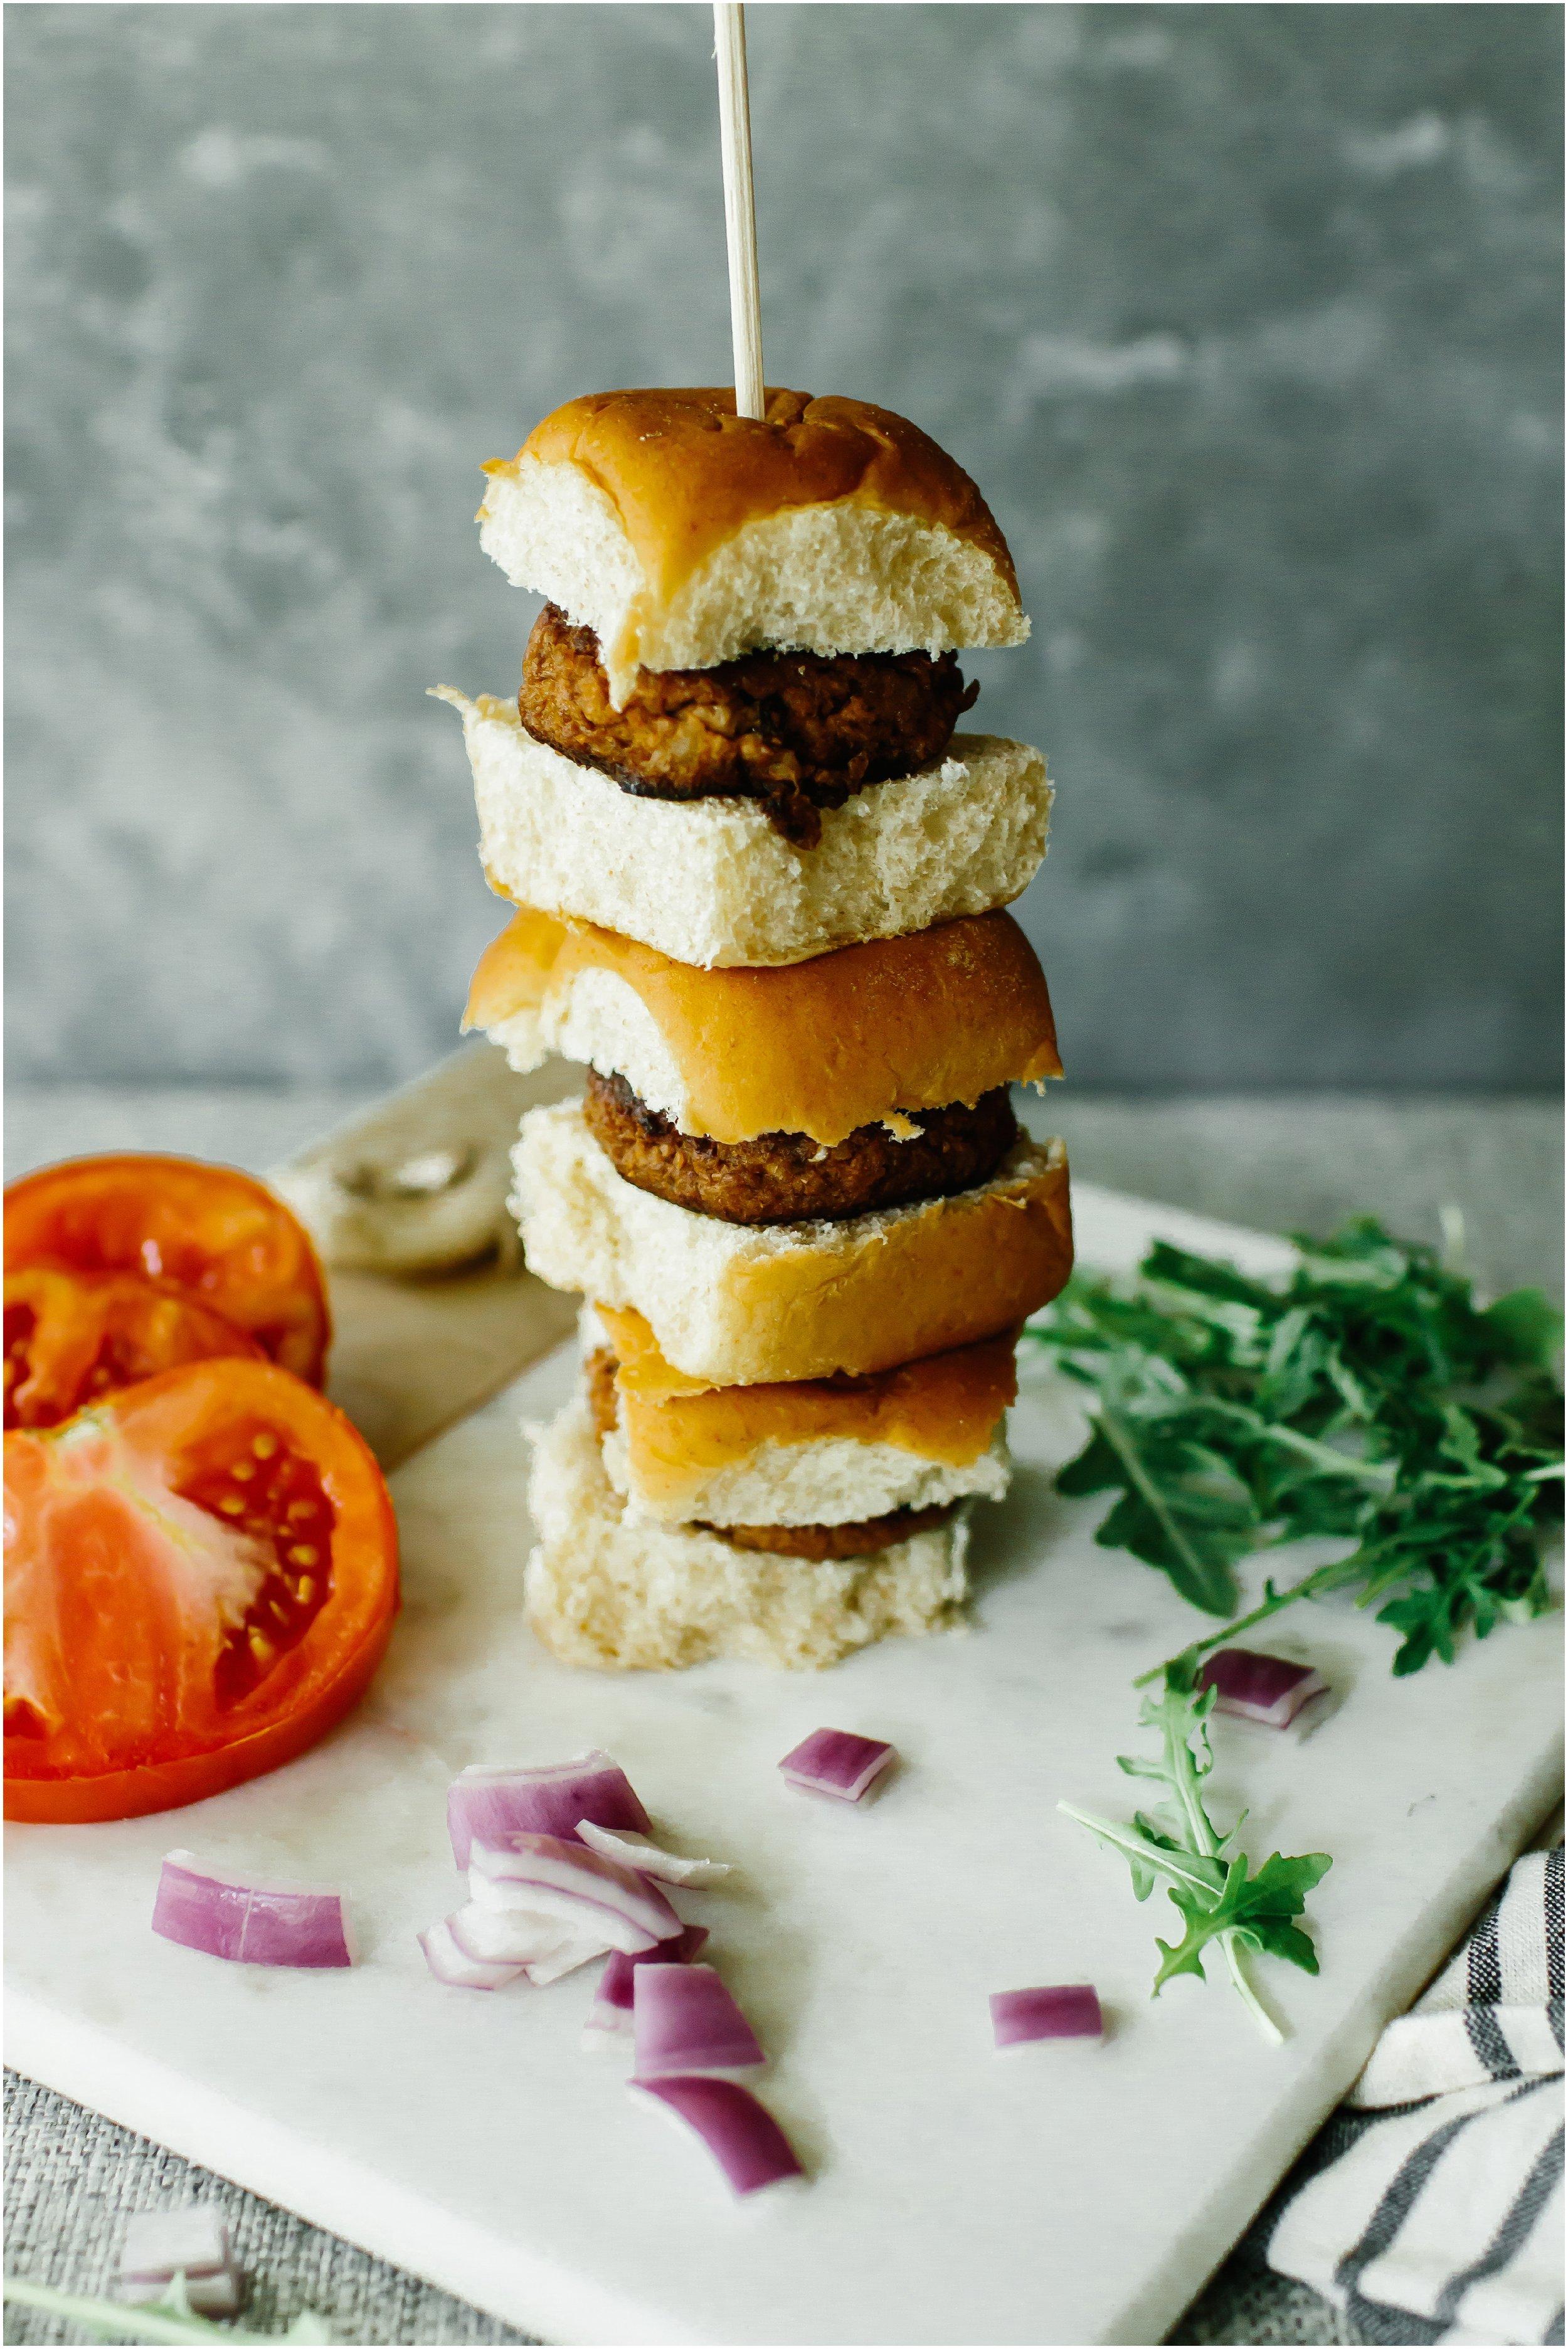 A&M_foodphotography_cookbook_0658.jpg